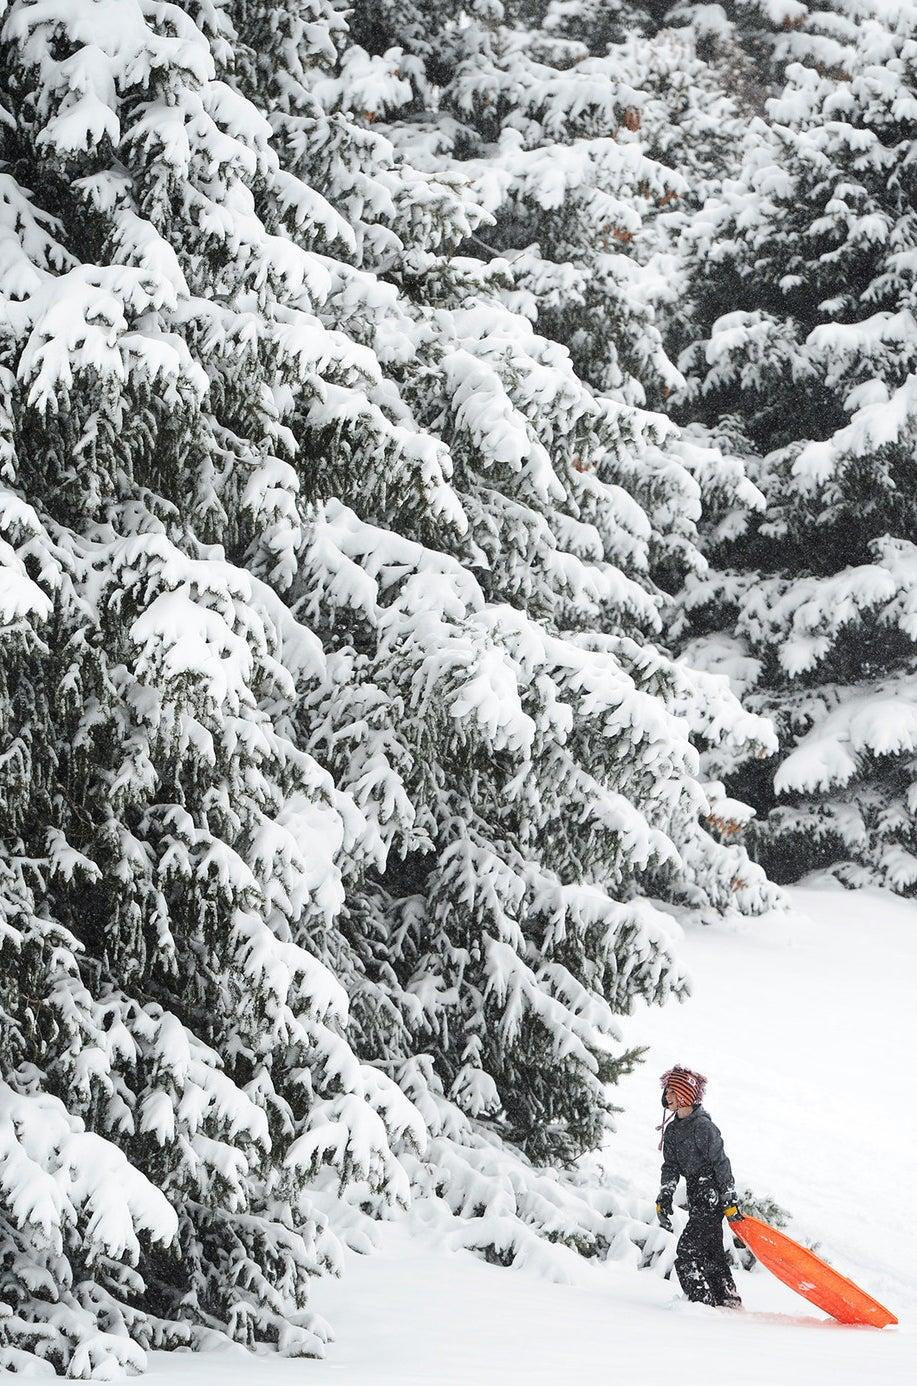 Lakewood, Colorado on February 16, 2015.